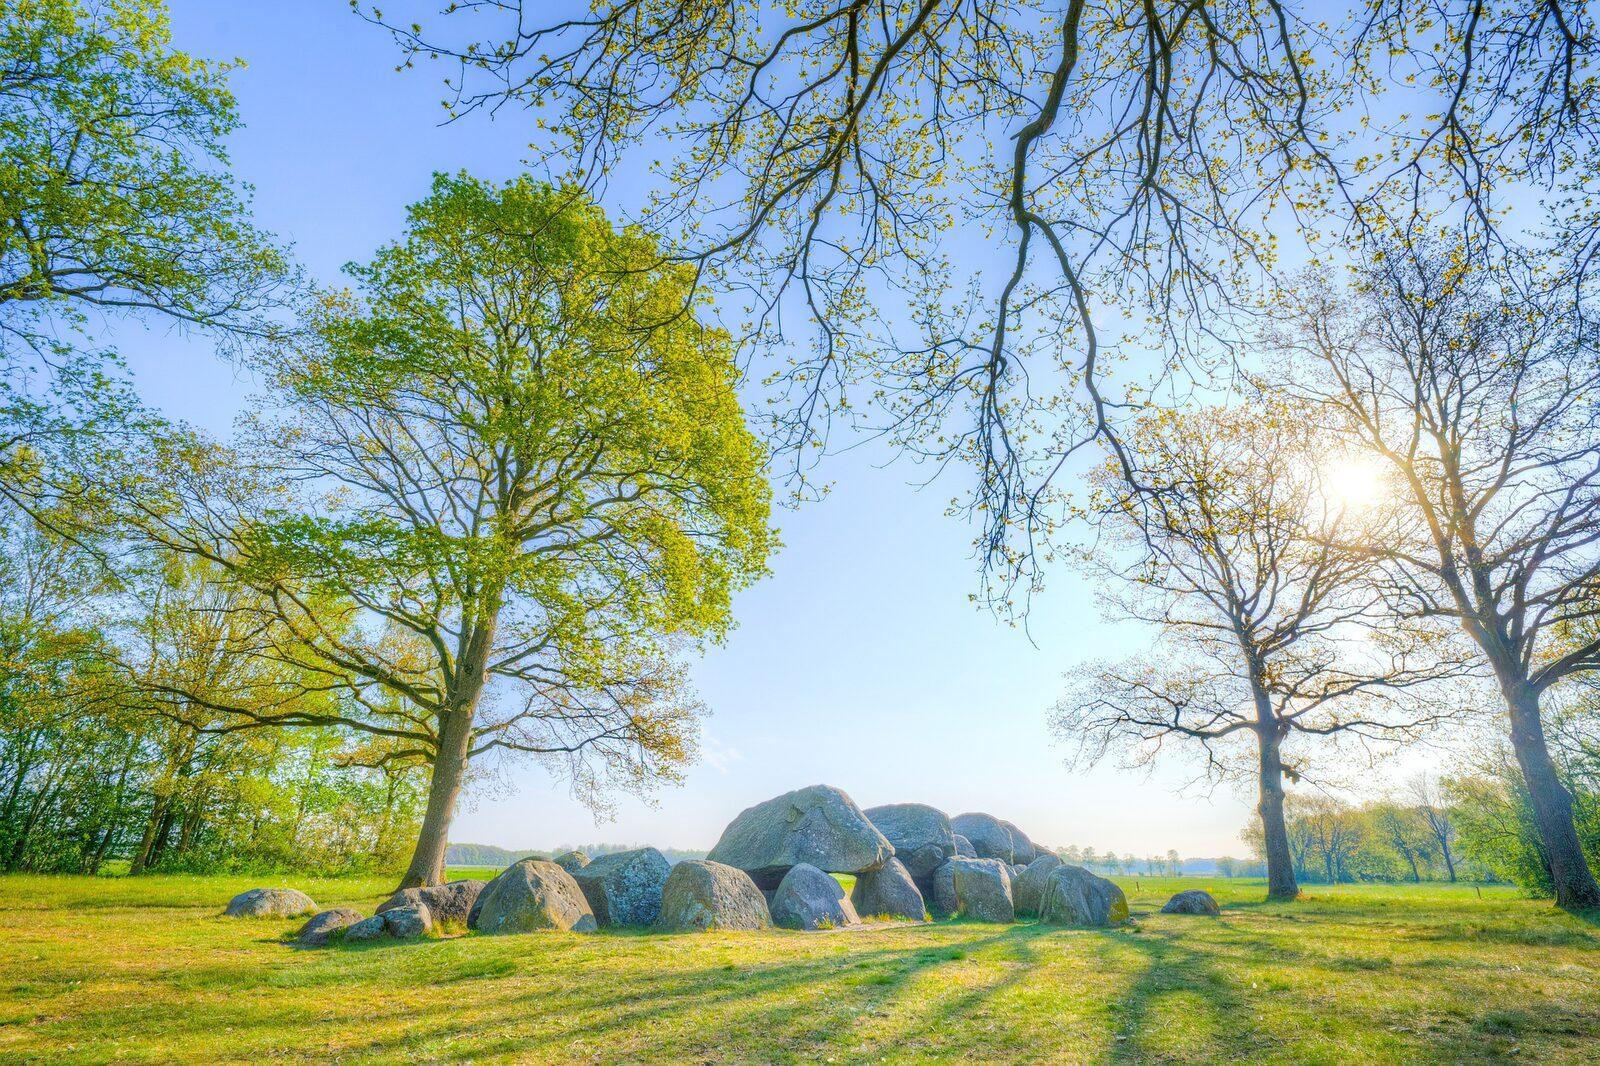 5x cultuur snuiven in Drenthe